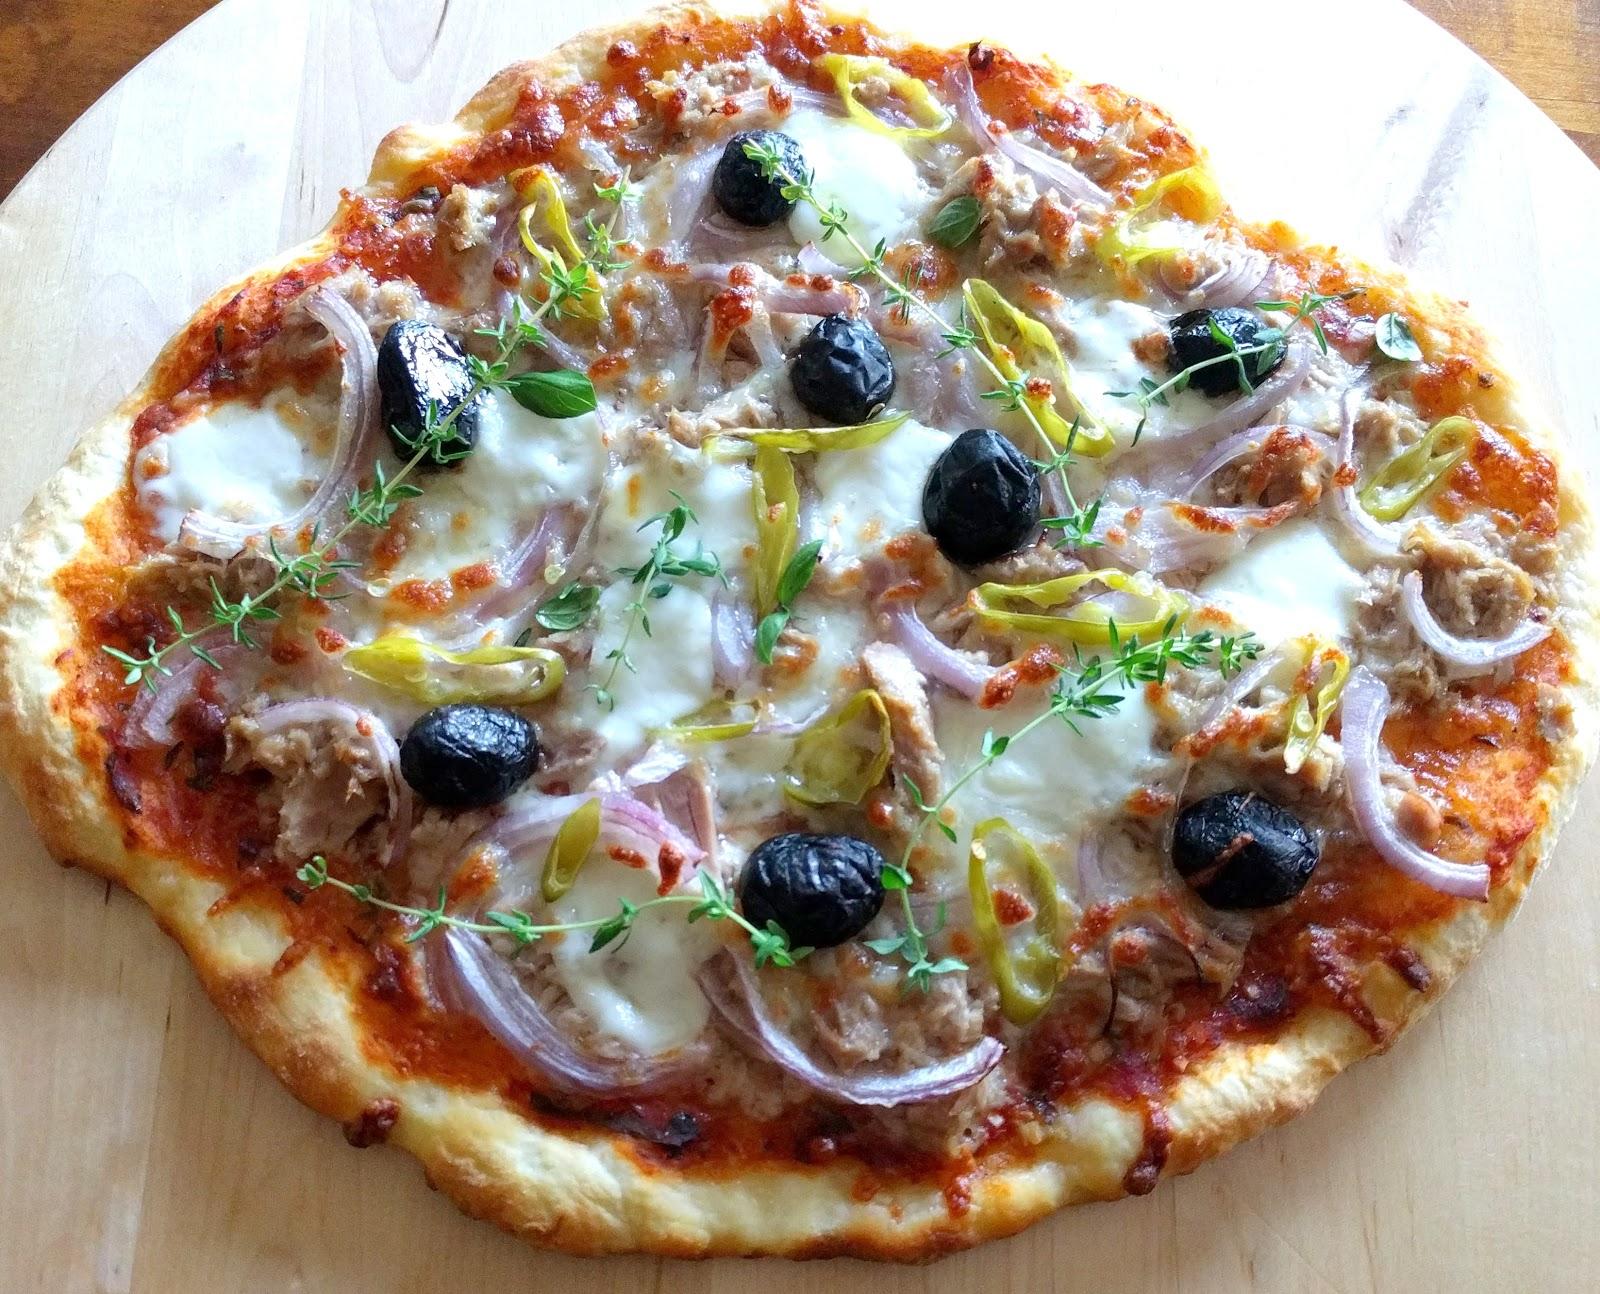 Schnatters Brodelstube: - Thunfisch Pizza & Pizza Hawaii